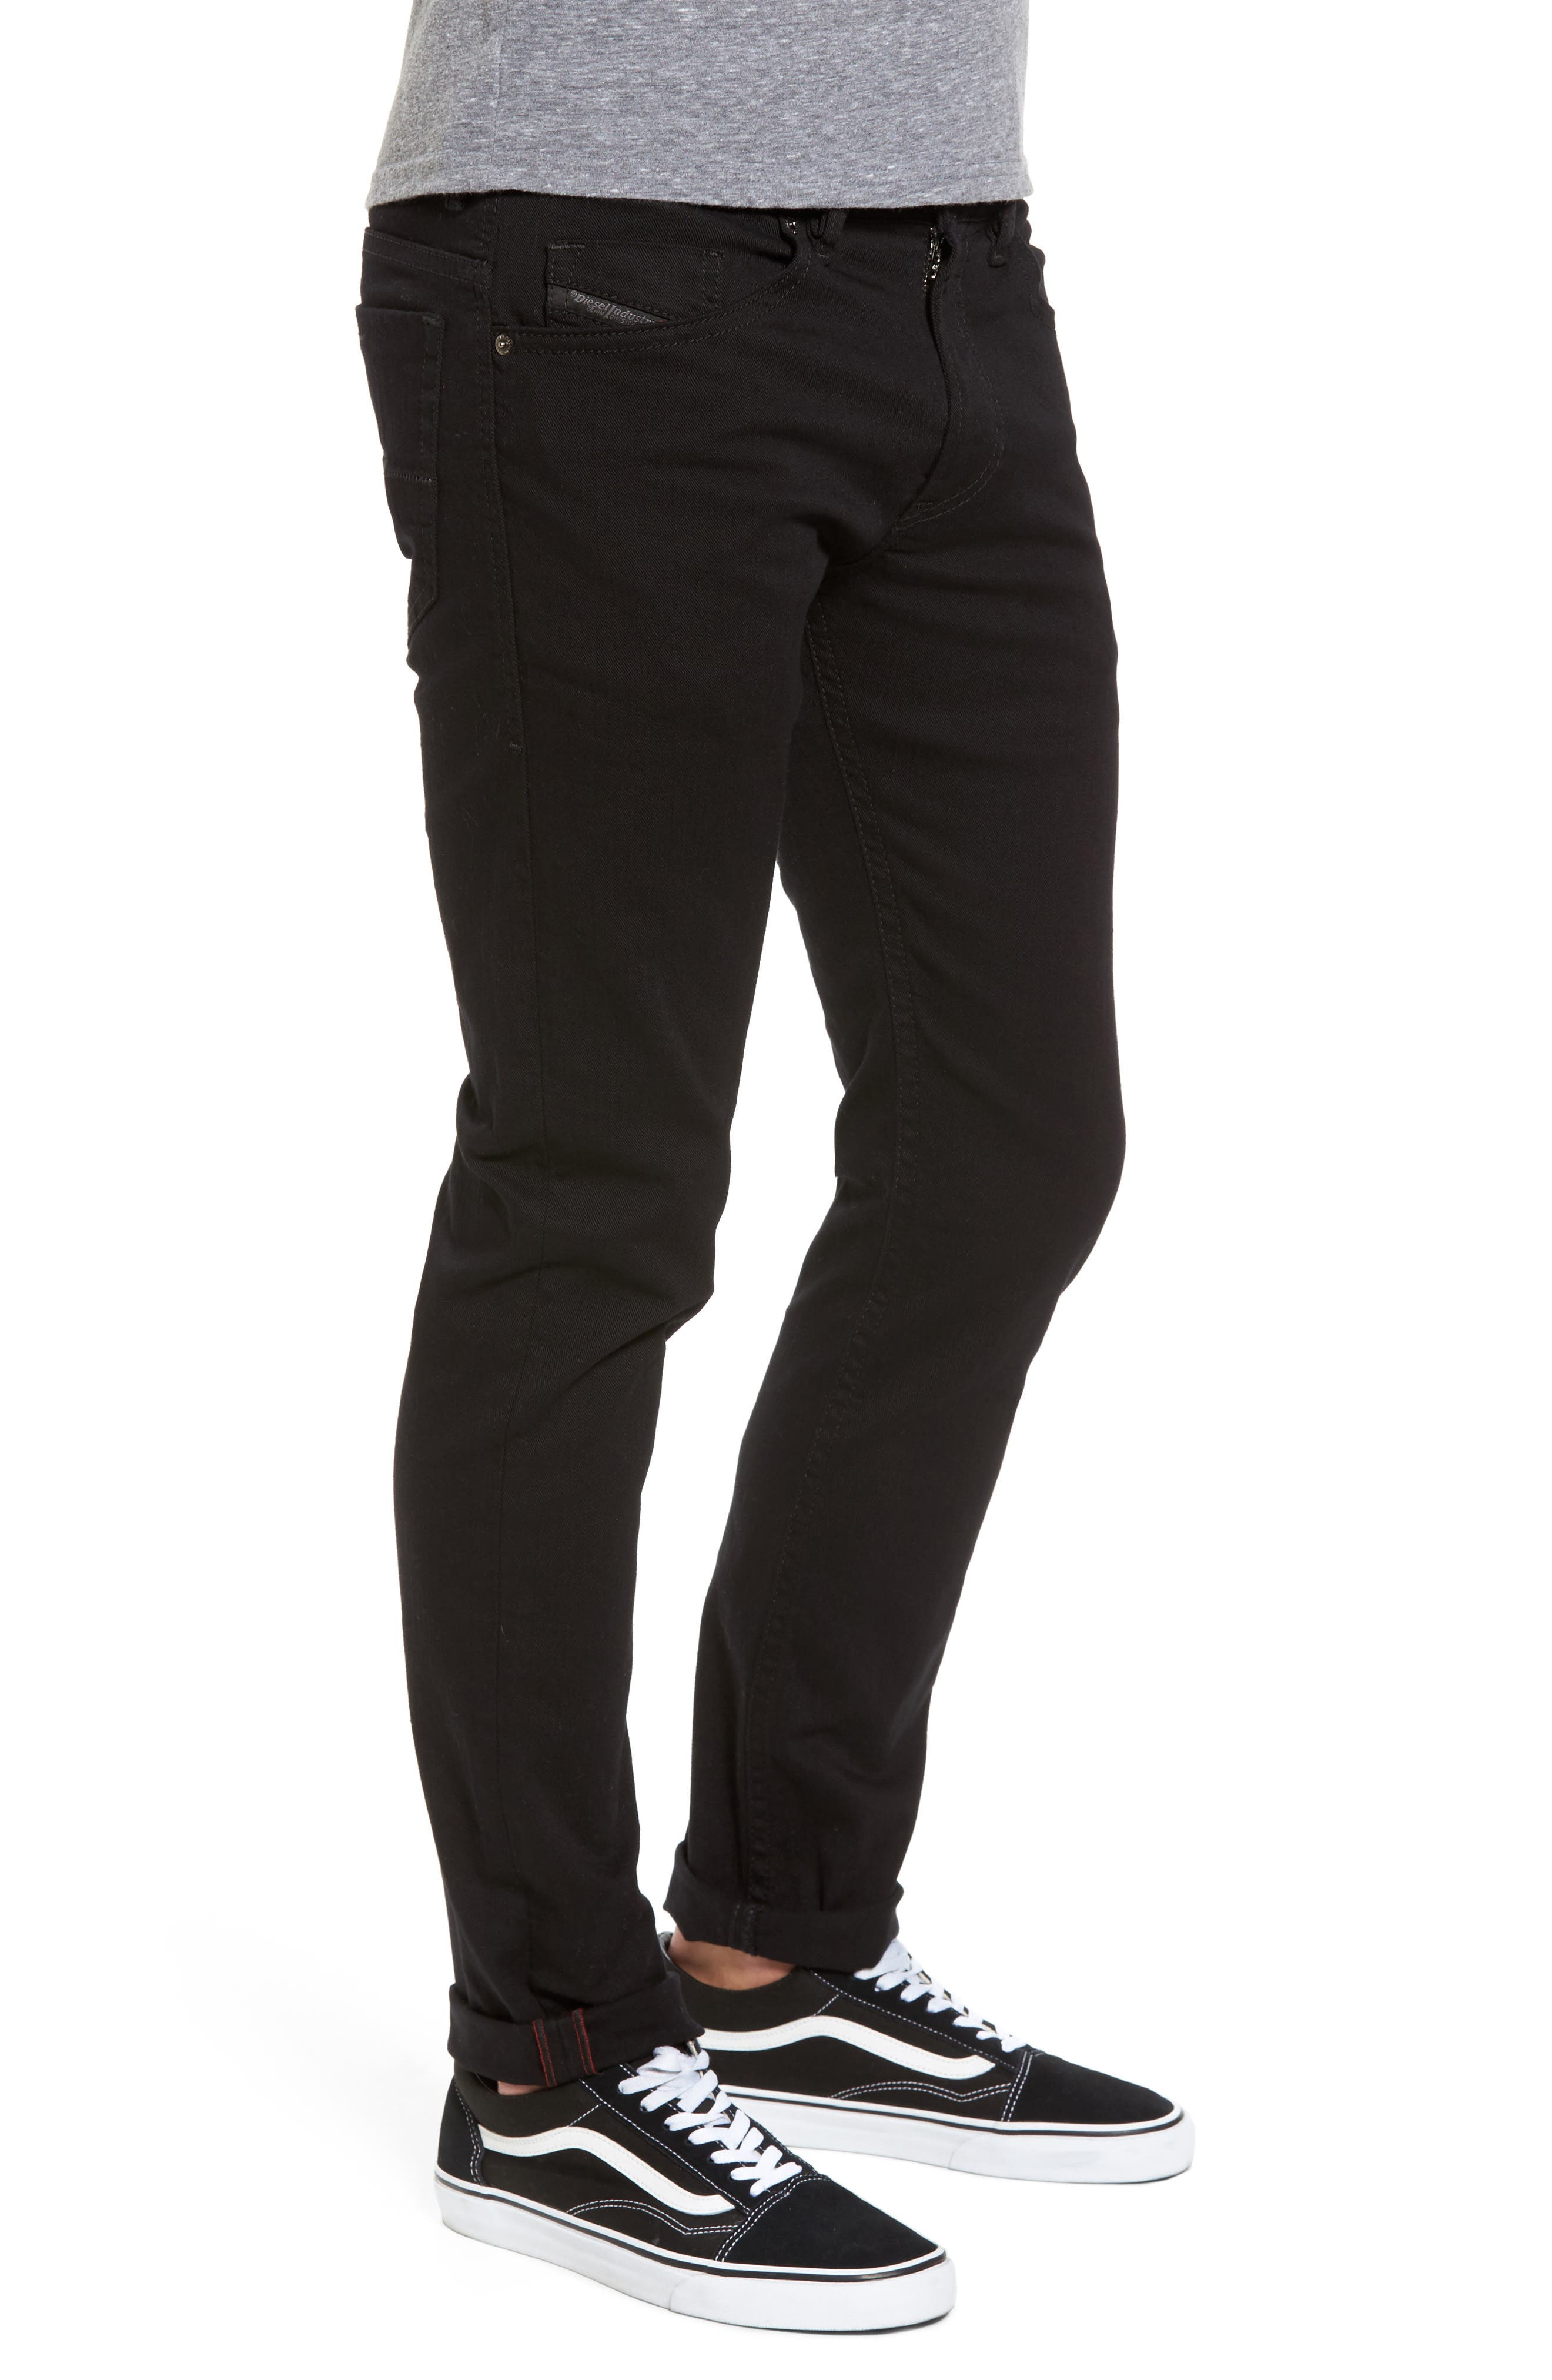 Thommer Slim Fit Jeans,                             Alternate thumbnail 3, color,                             Black/ Denim